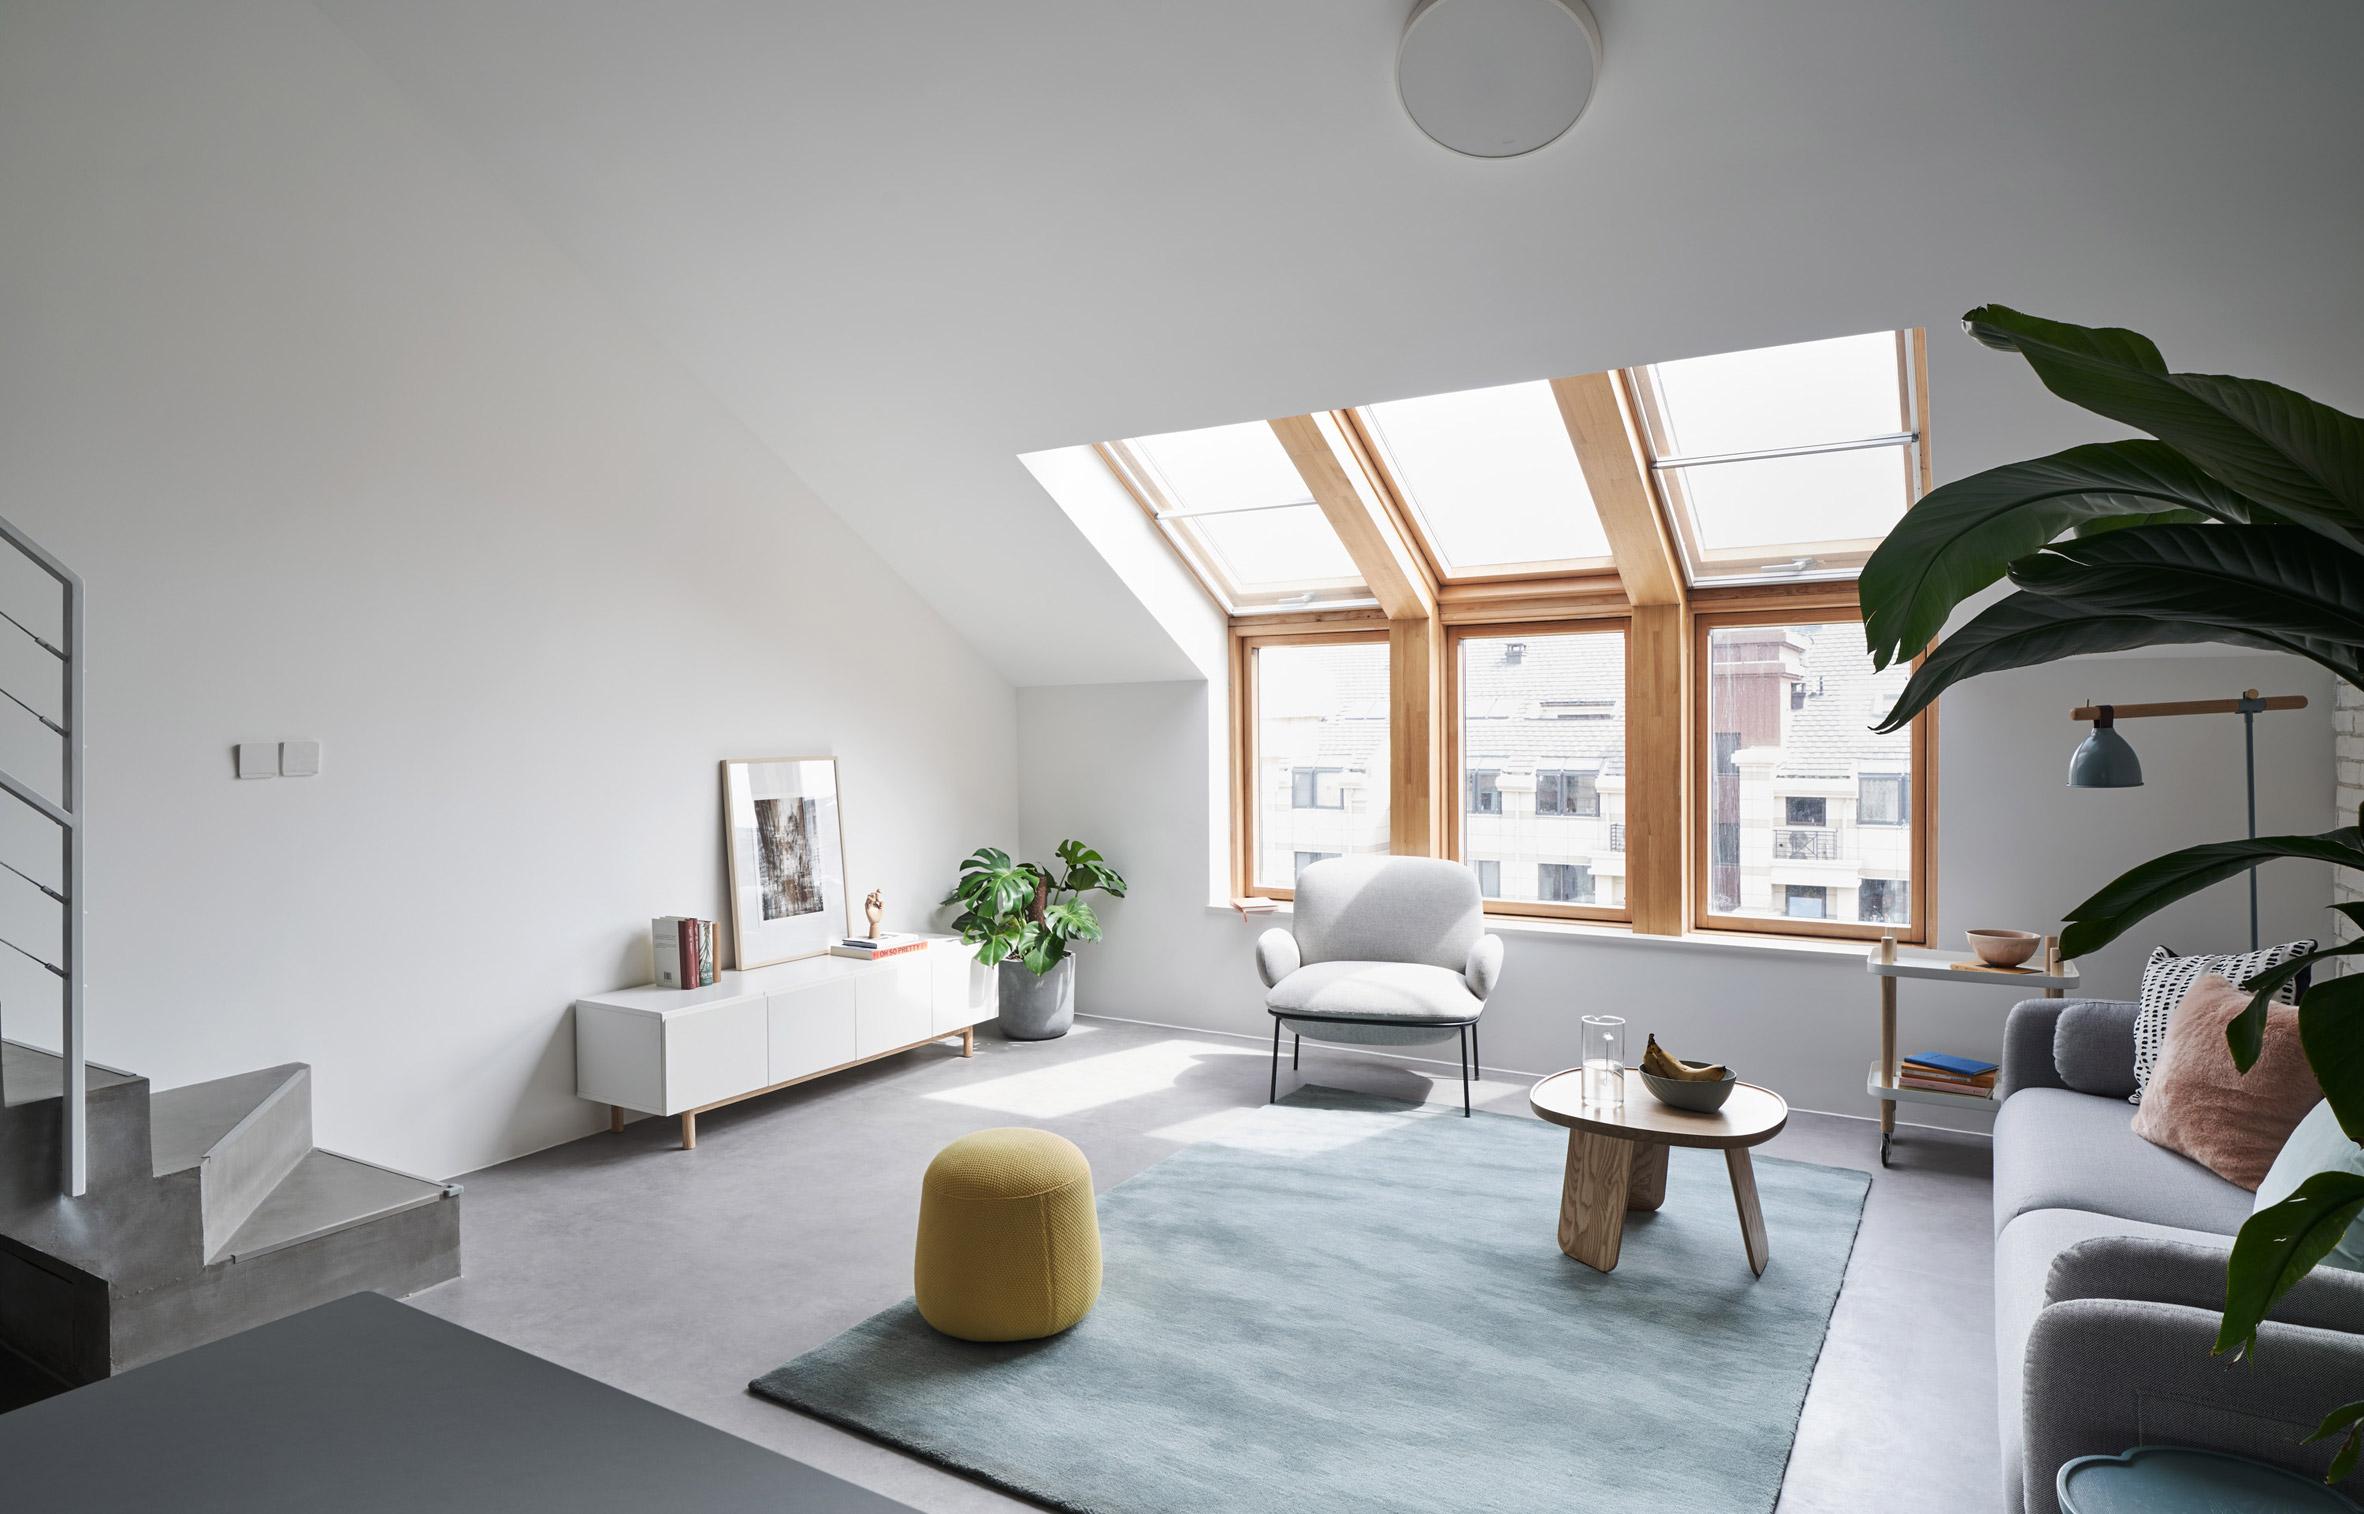 căn hộ cho gia đình trẻ starburst-house-hao-design-interiors-residential-china-beijing-elledecoration vietnam 10